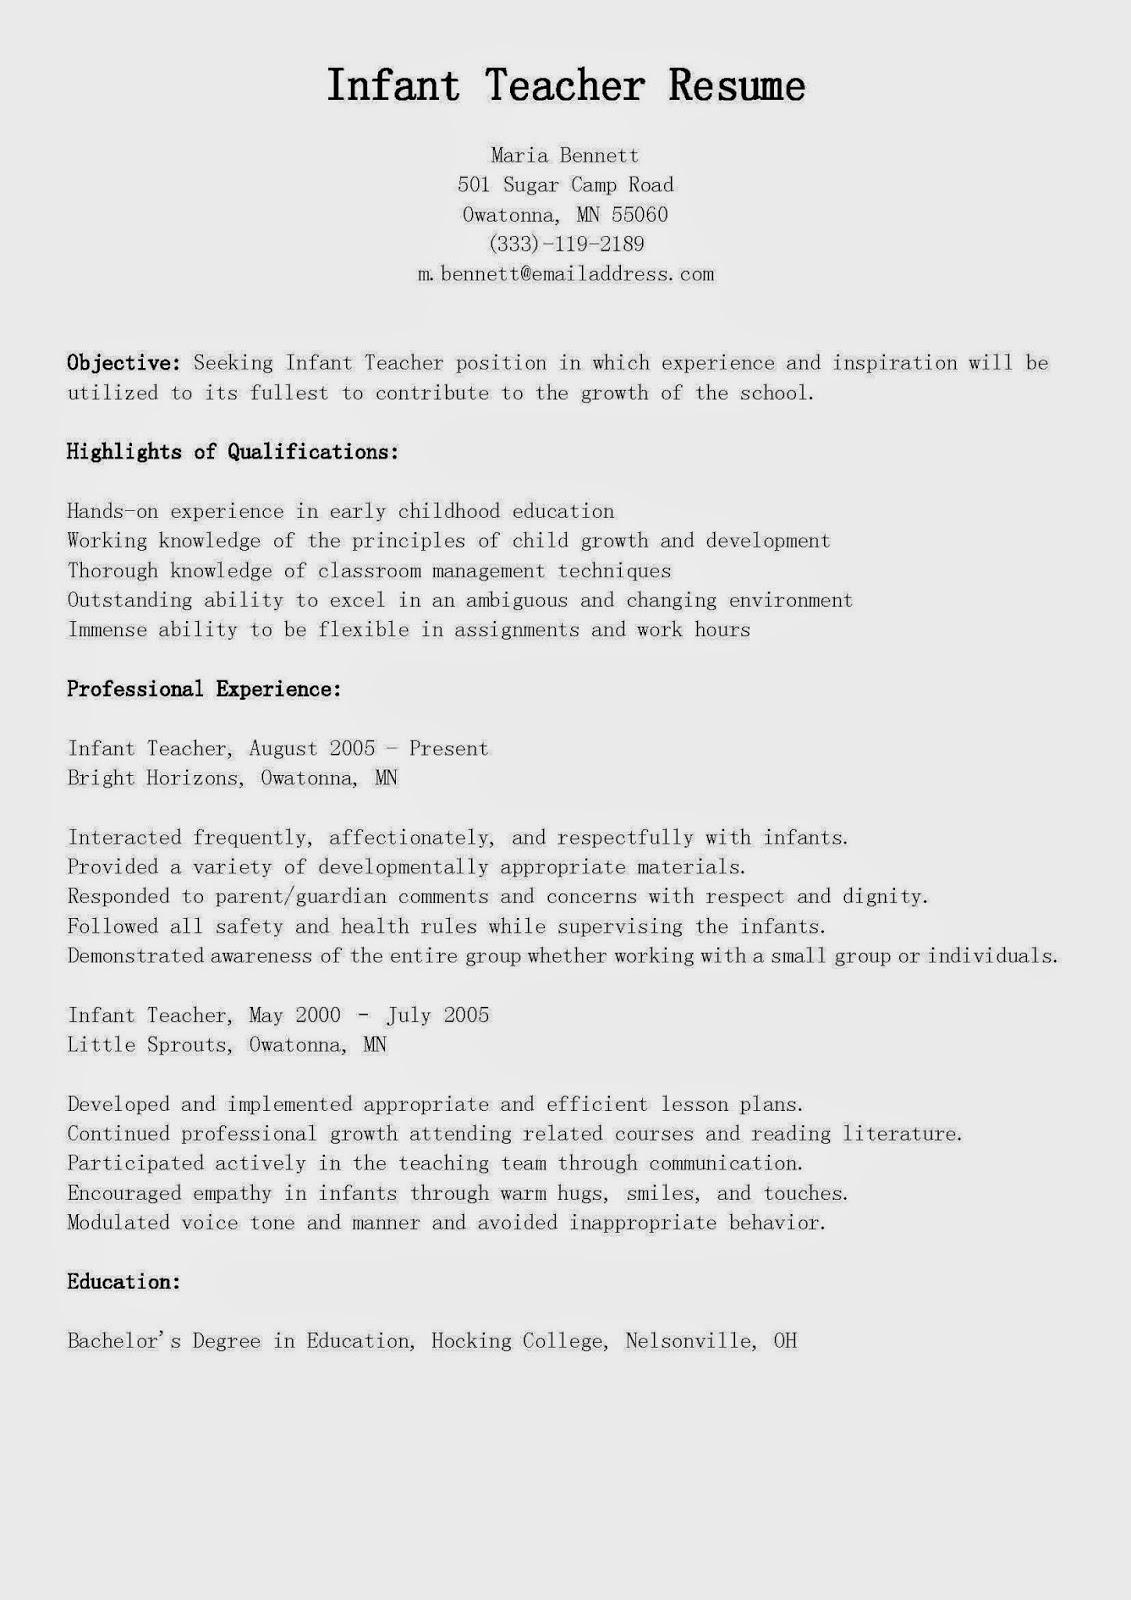 resume description for golf course